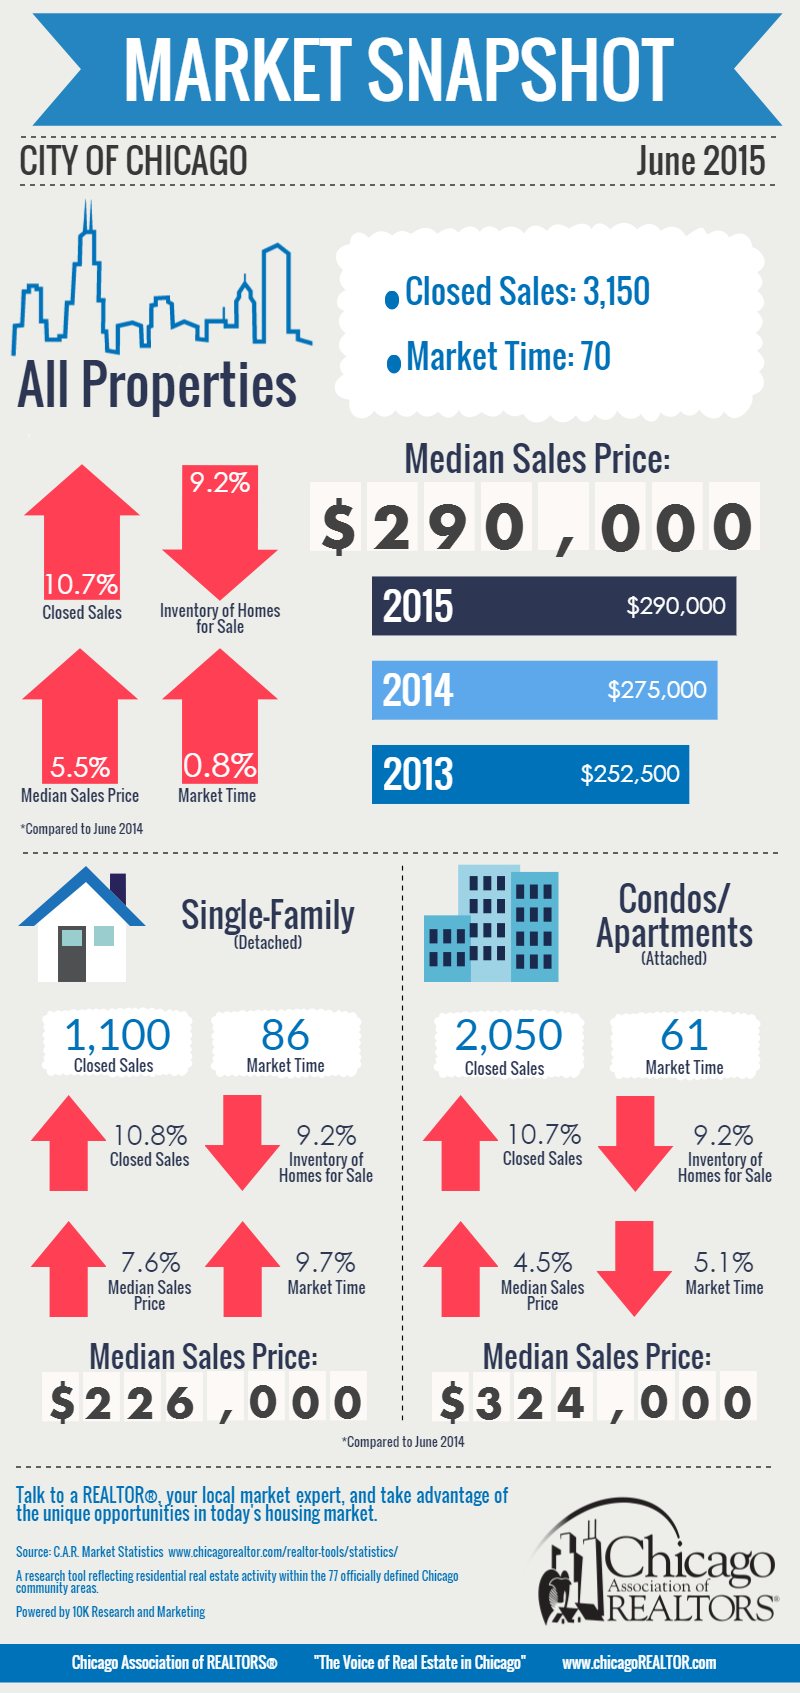 June 2015 Market Snapshot Infographic Chicago